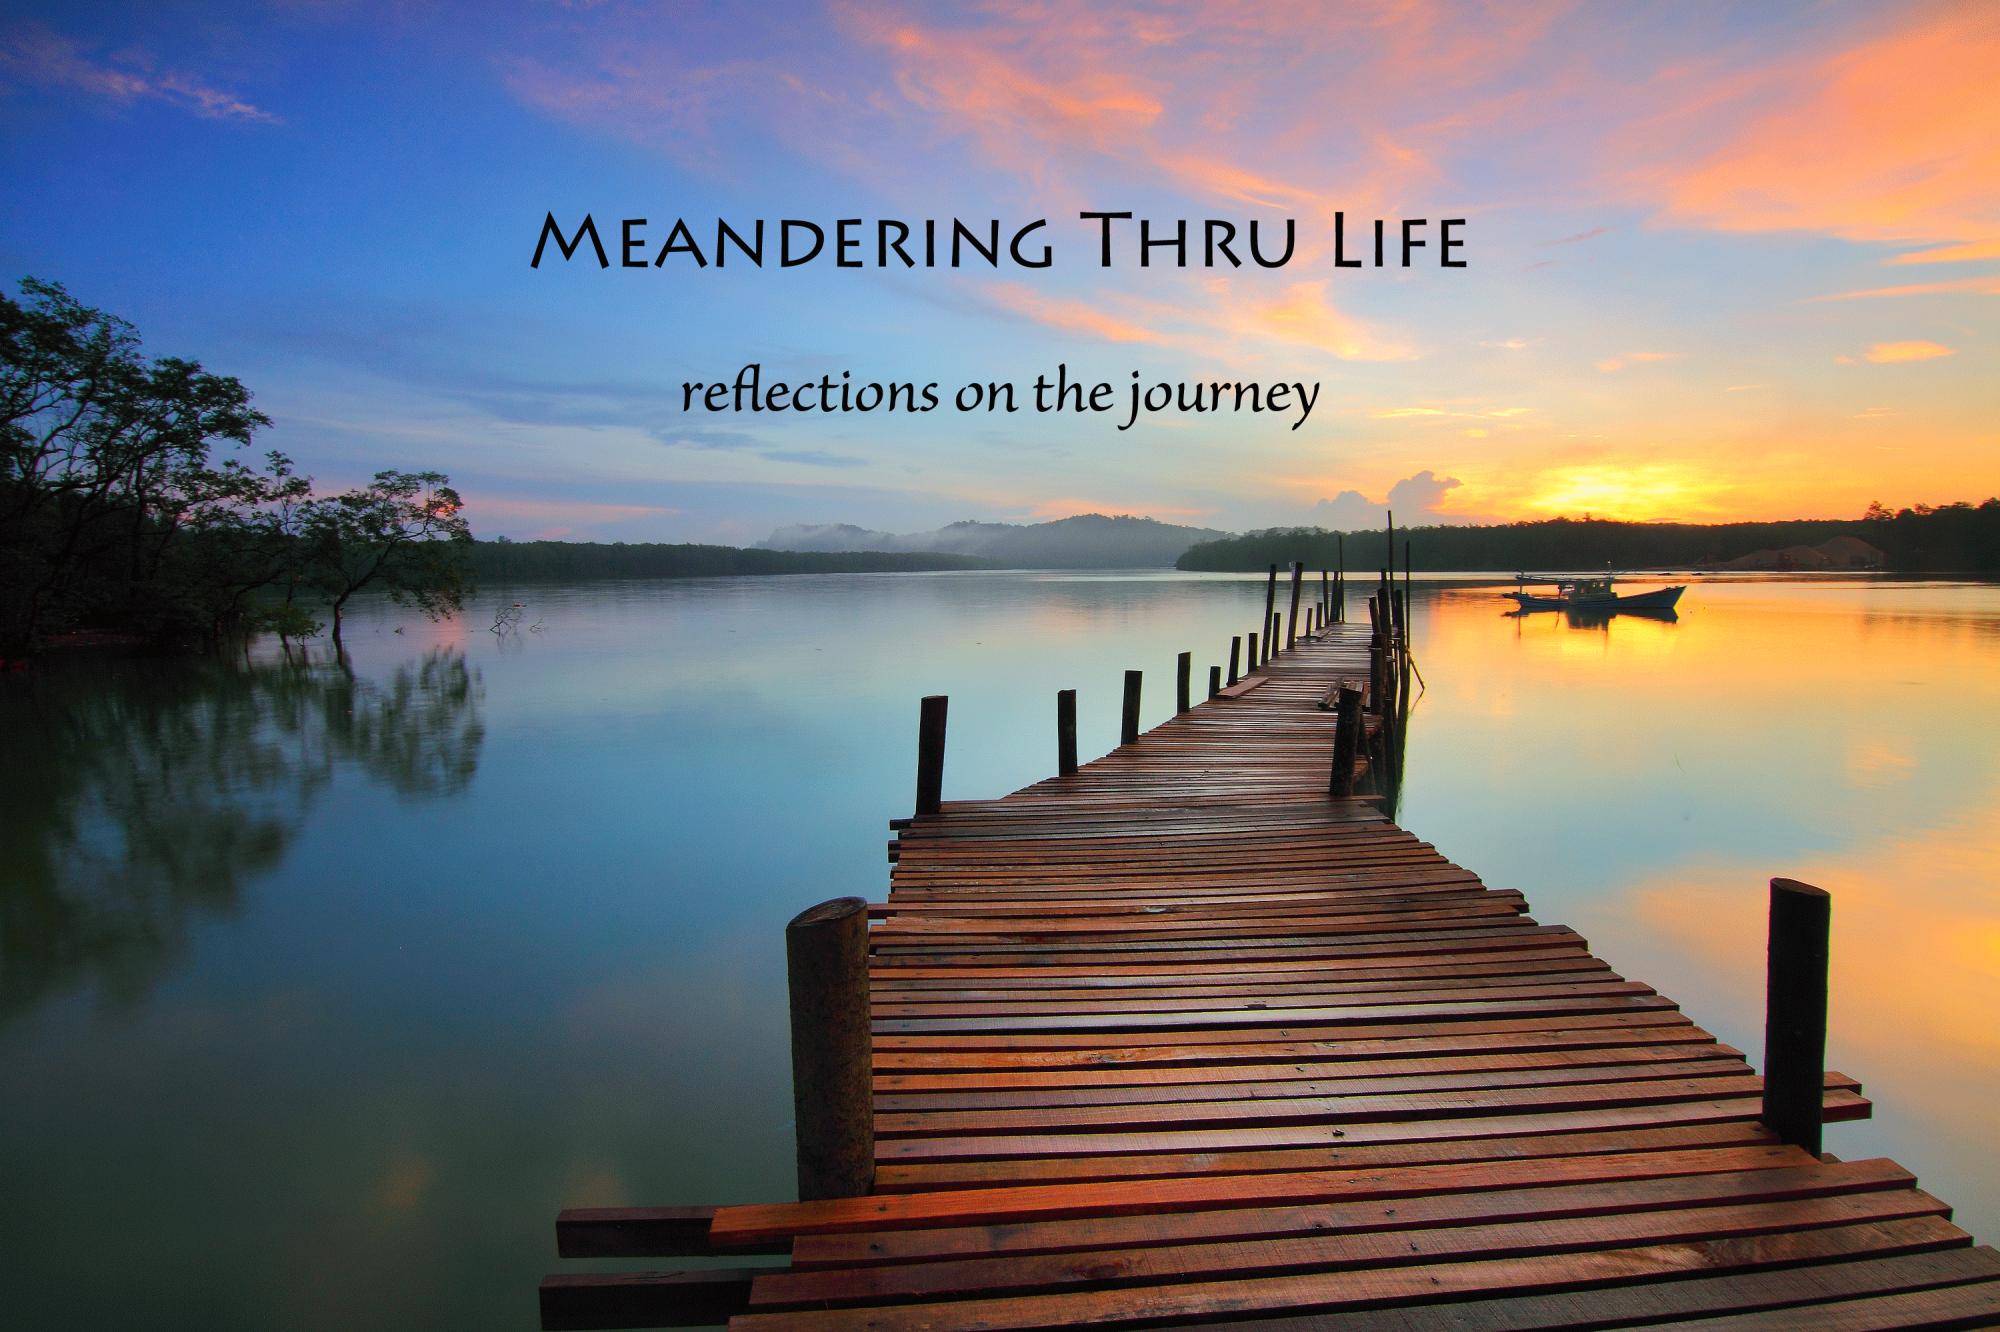 Meandering thru life